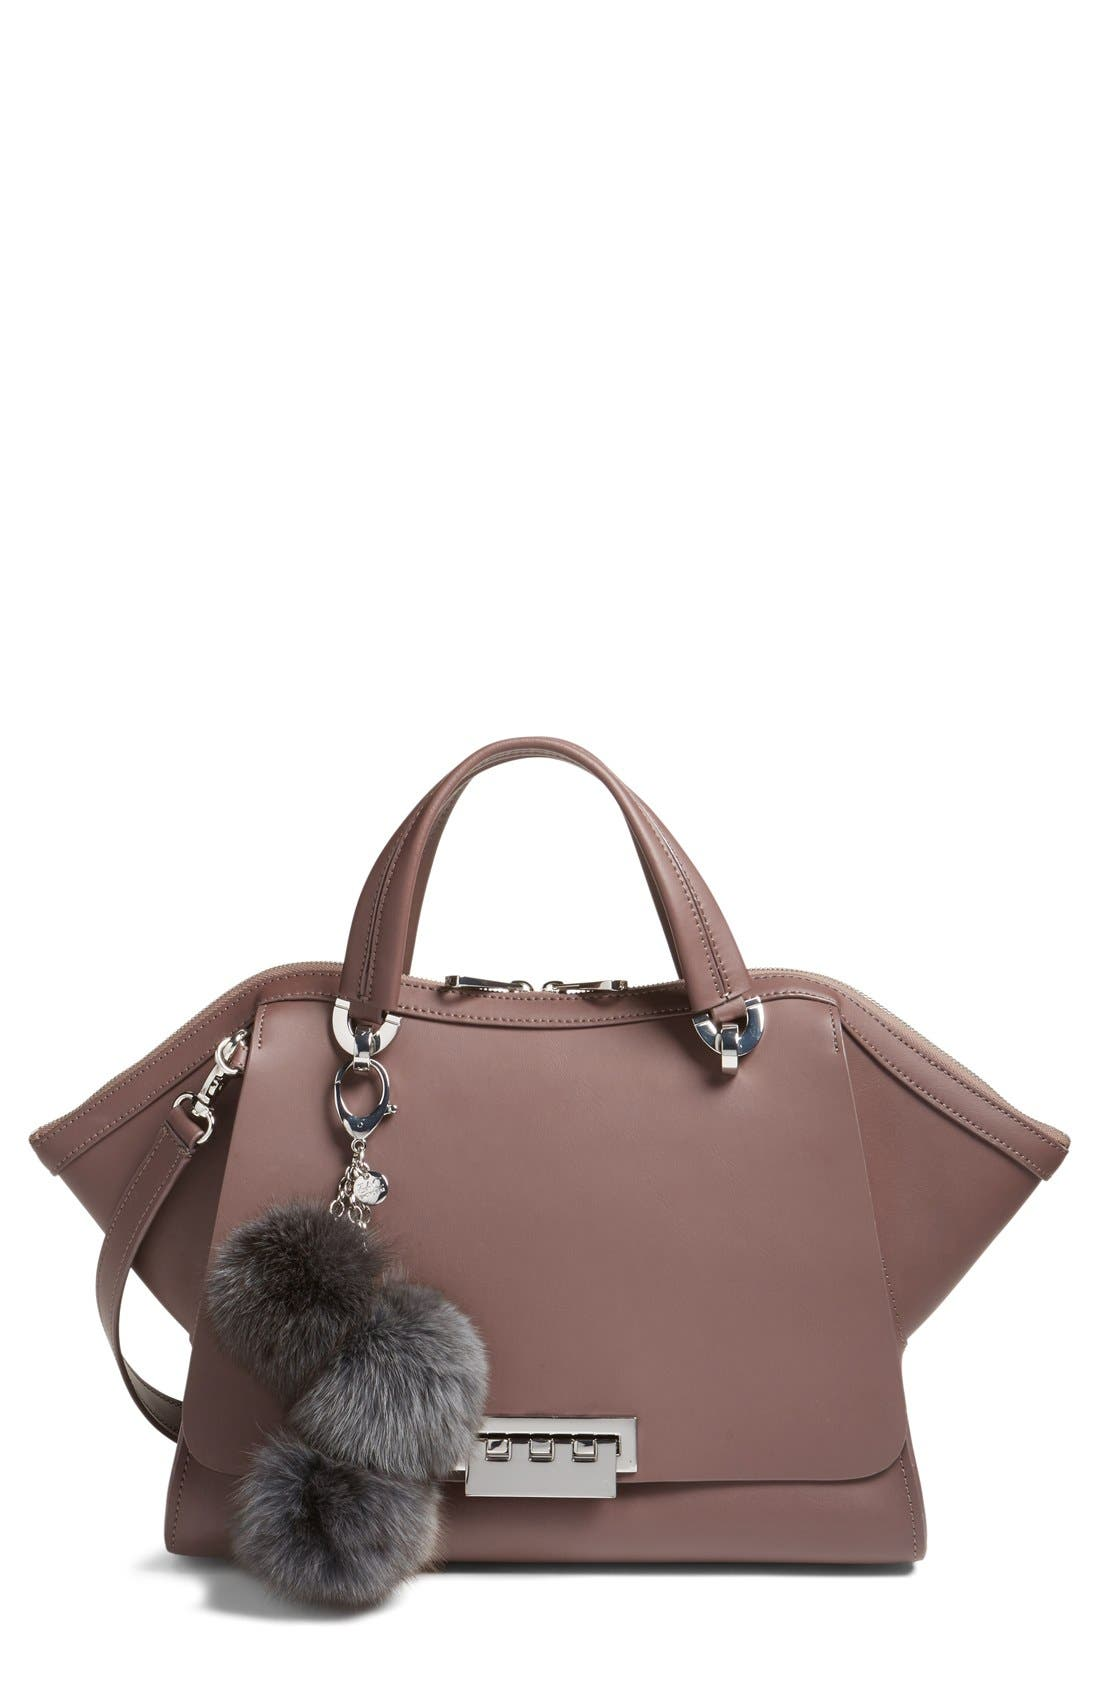 Main Image - ZAC Zac Posen Jumbo Eartha Iconic Leather Satchel with Genuine Fox Fur Bag Charm